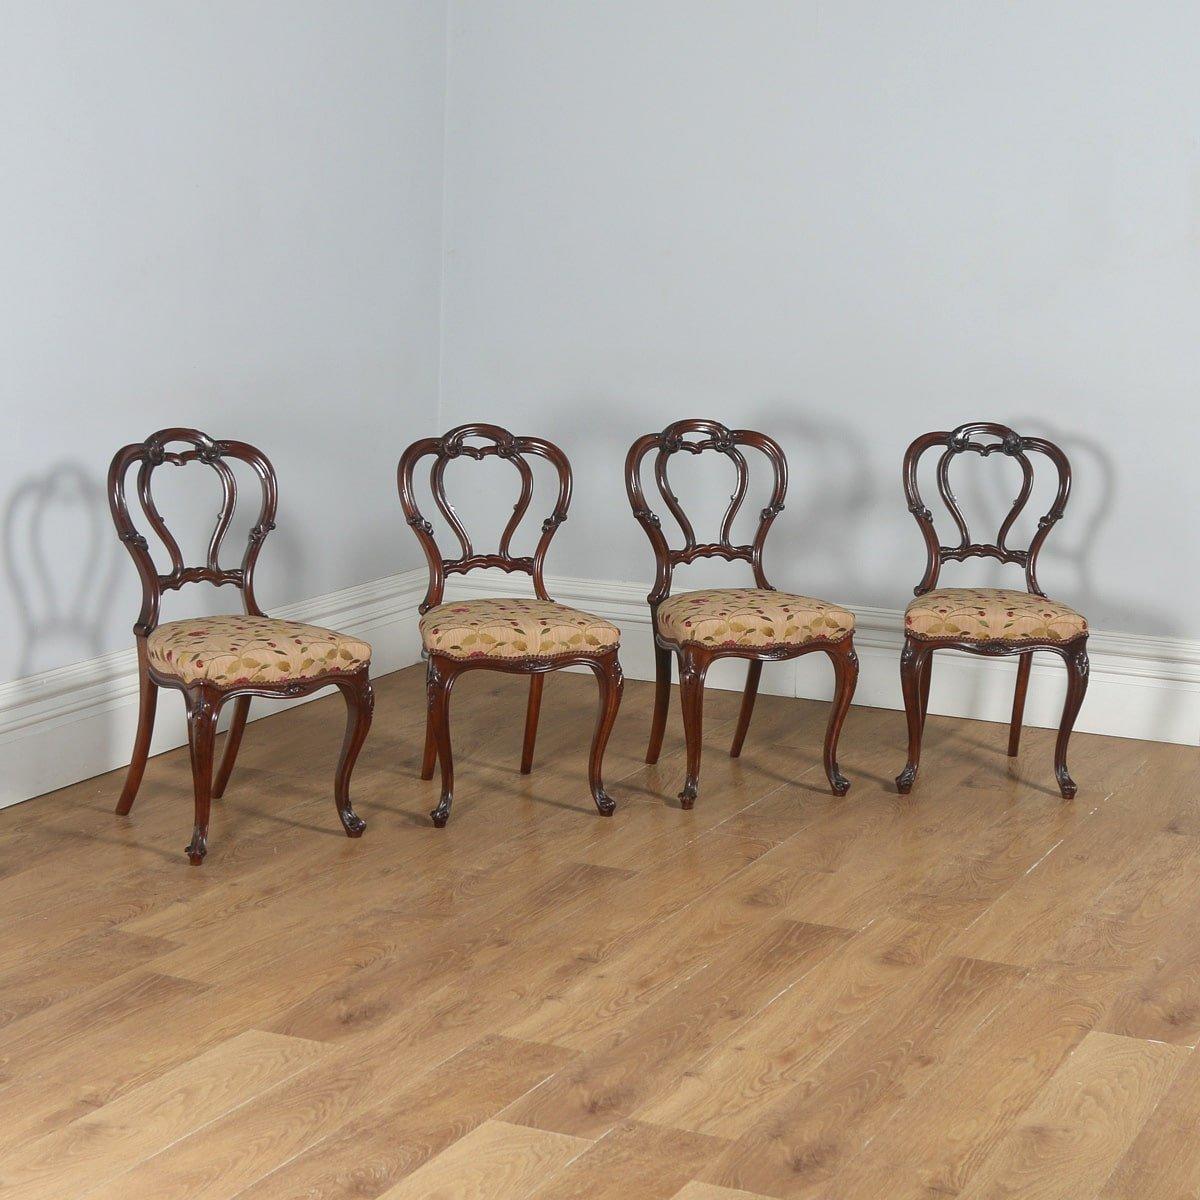 Antique English Victorian Set of Four Walnut Dining Chairs (Circa 1860) - yolagray.com